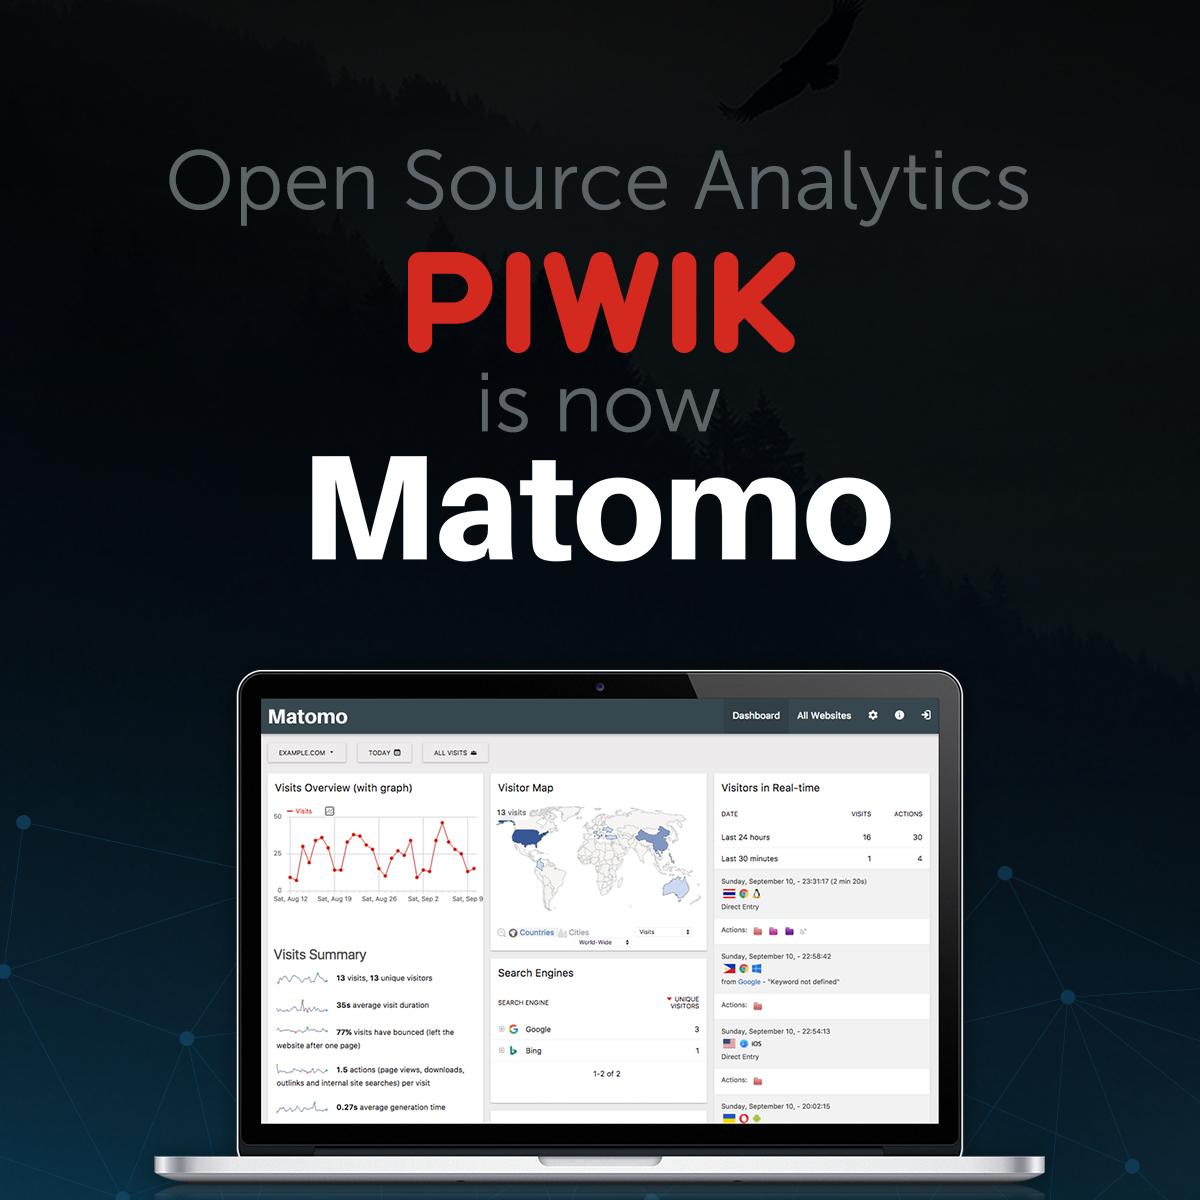 https://matomo.org/wp-content/uploads/2018/01/banner_piwik_is_now_matomo.jpg